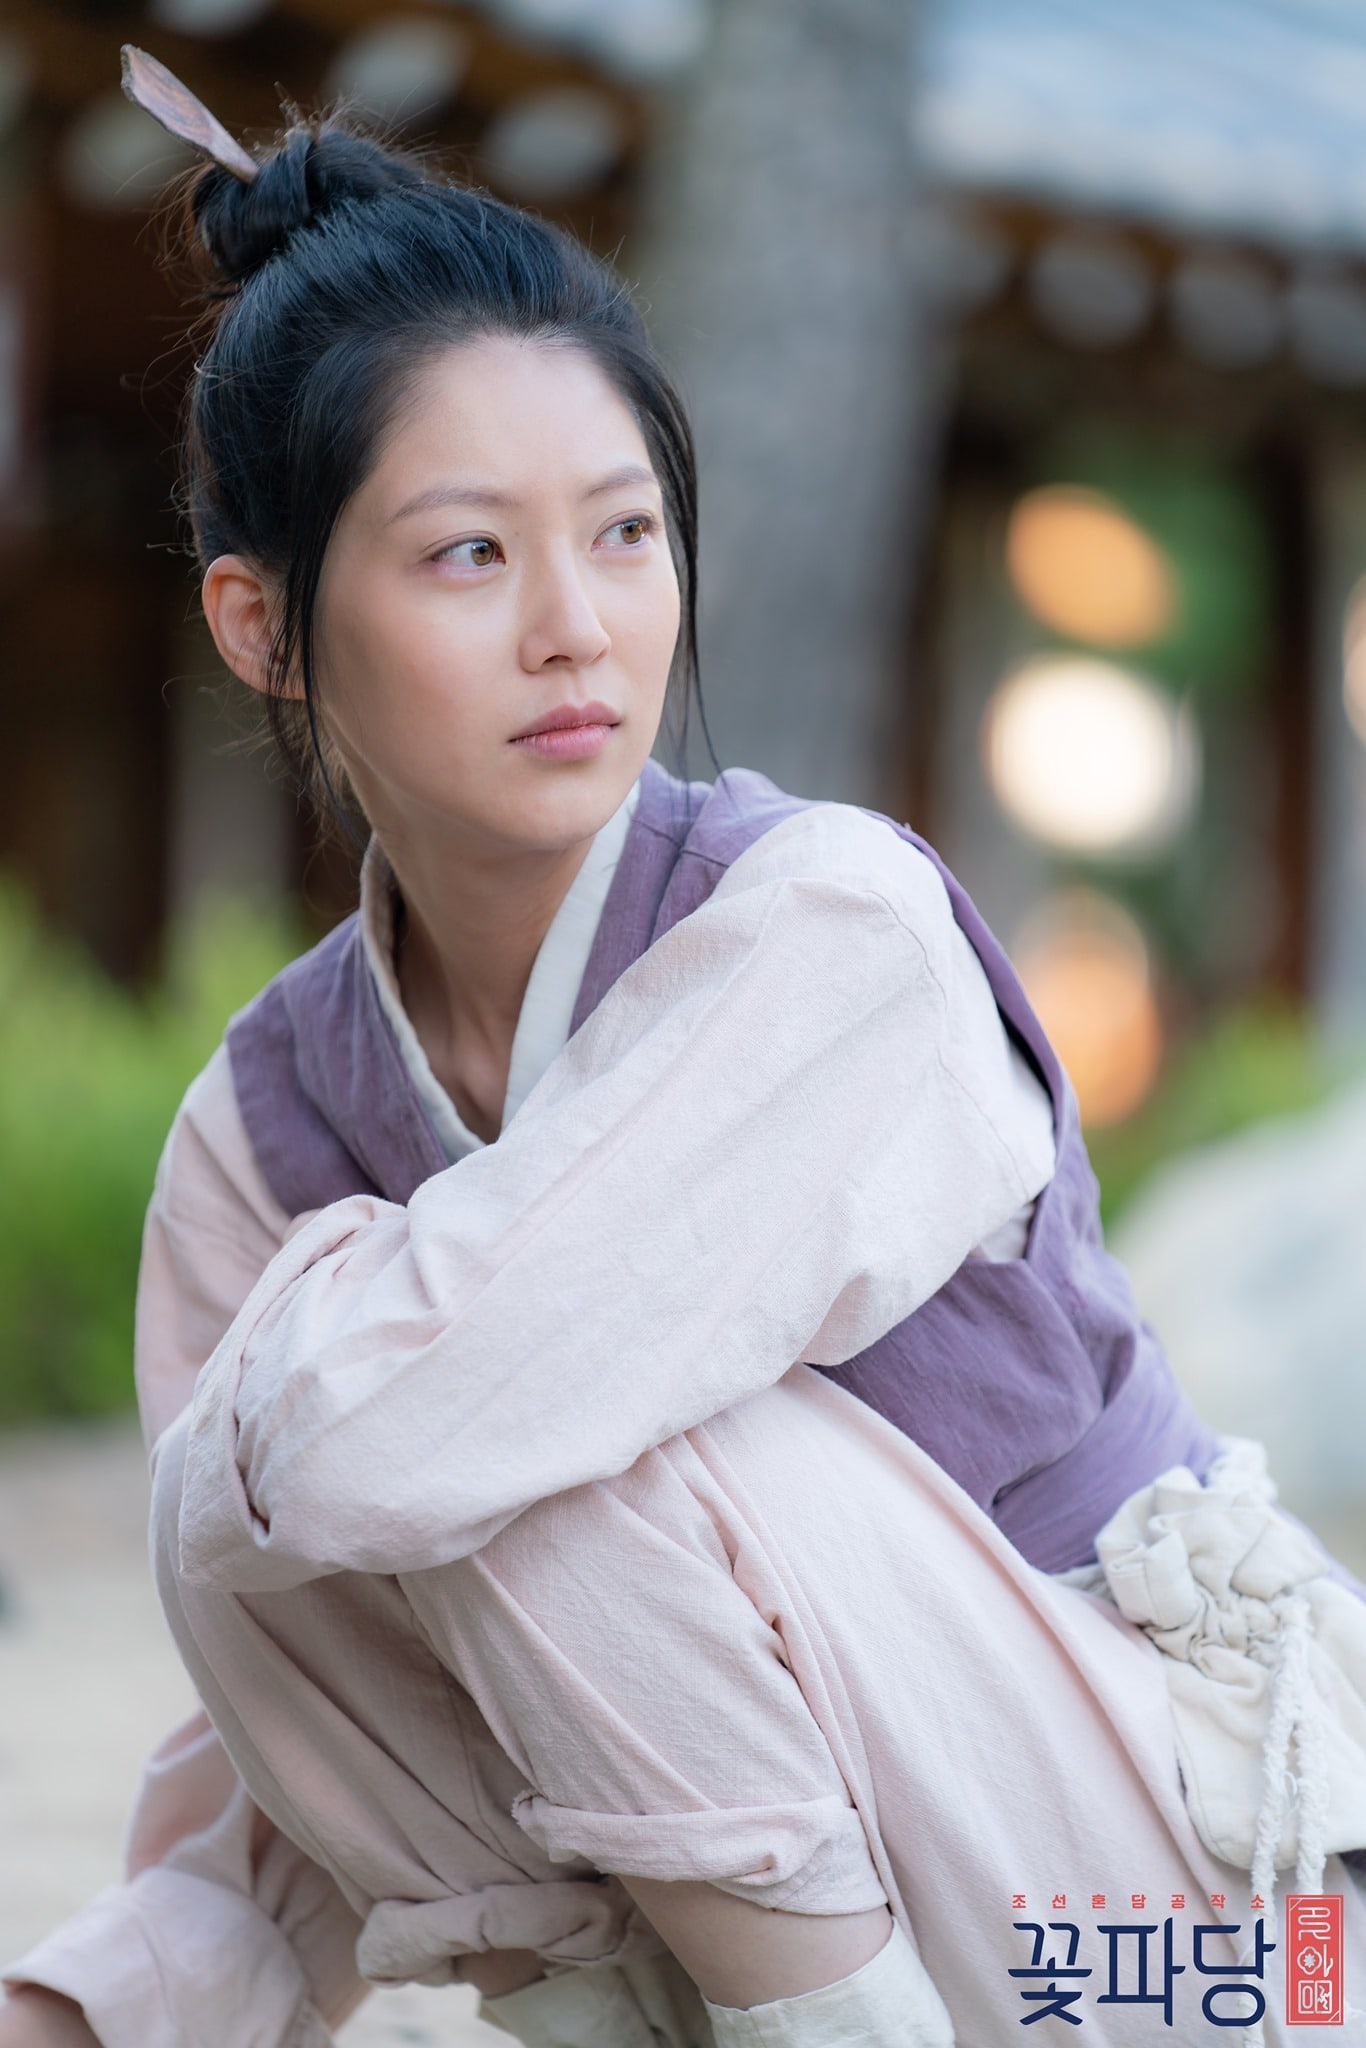 gong-seung-yeon-flower-crew-joseon-marriage-agency